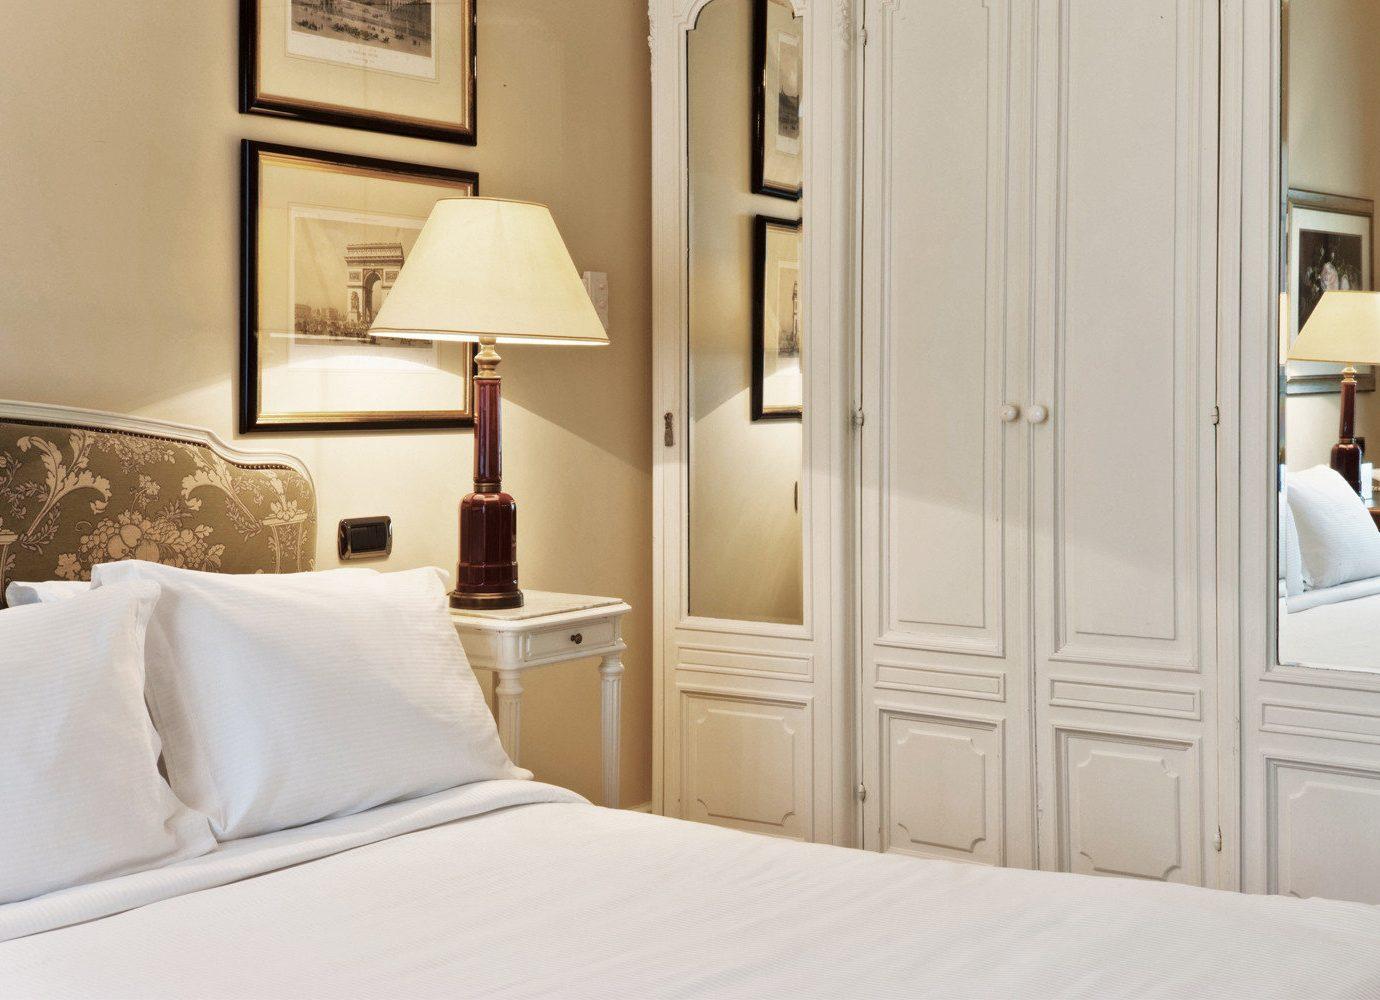 Bedroom Elegant Luxury Suite white bed sheet textile